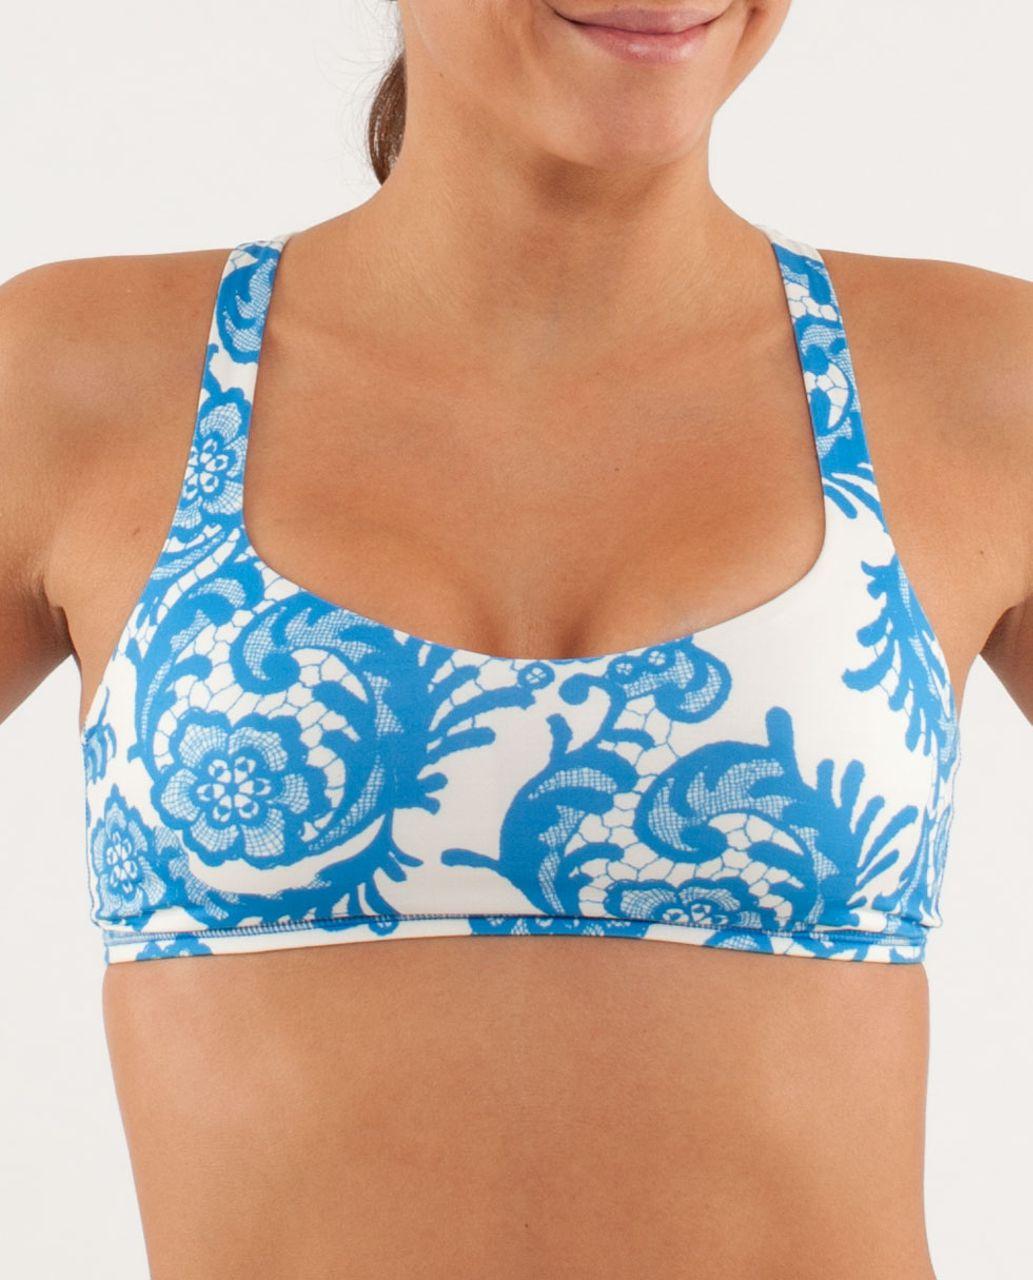 cdaaa7cf48c57 Lululemon Free To Be Bra - Laceoflage Polar Cream Beaming Blue ...